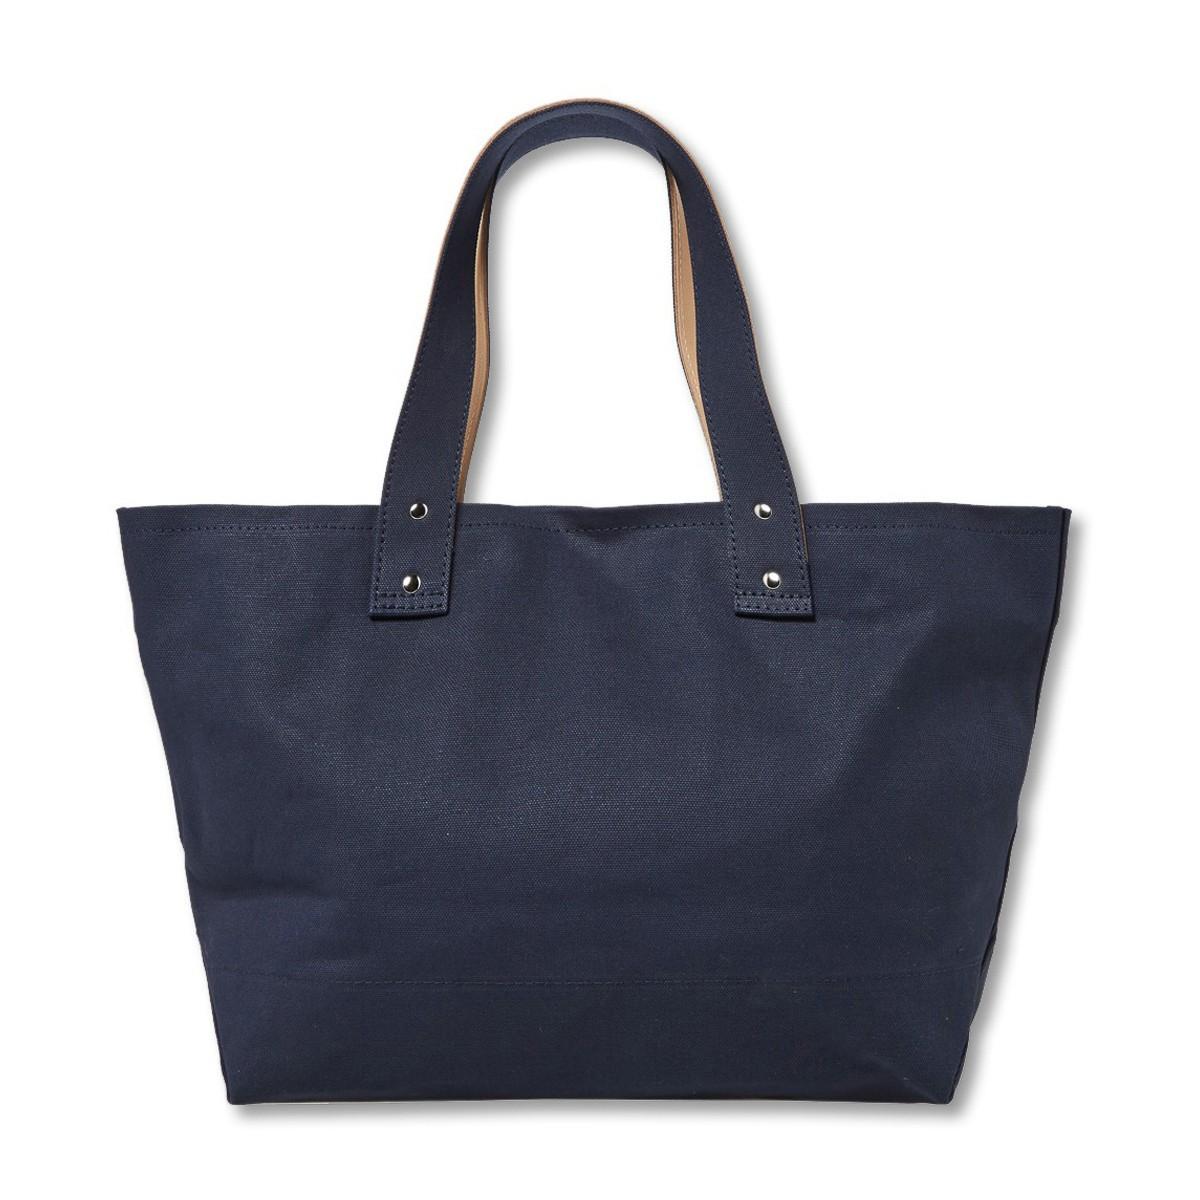 Nanamica Cotton Tote Bag L in Navy (Blue)